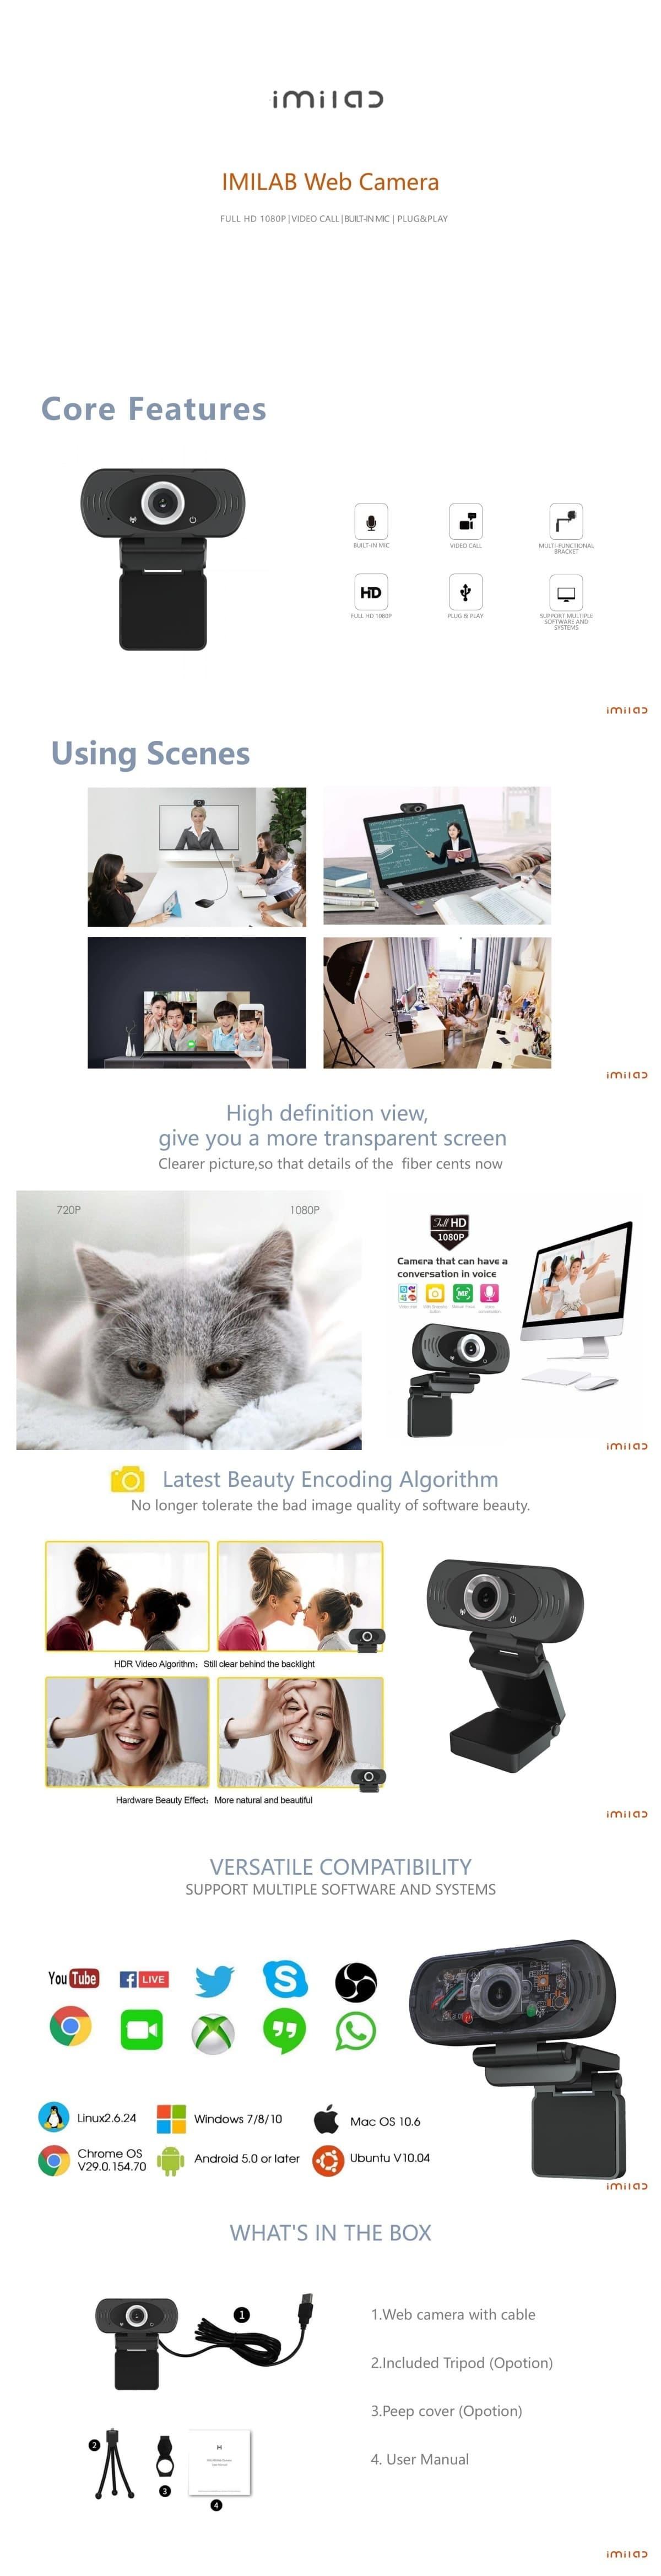 IMILAB-Web-Camerace044b5348989ad5.jpg